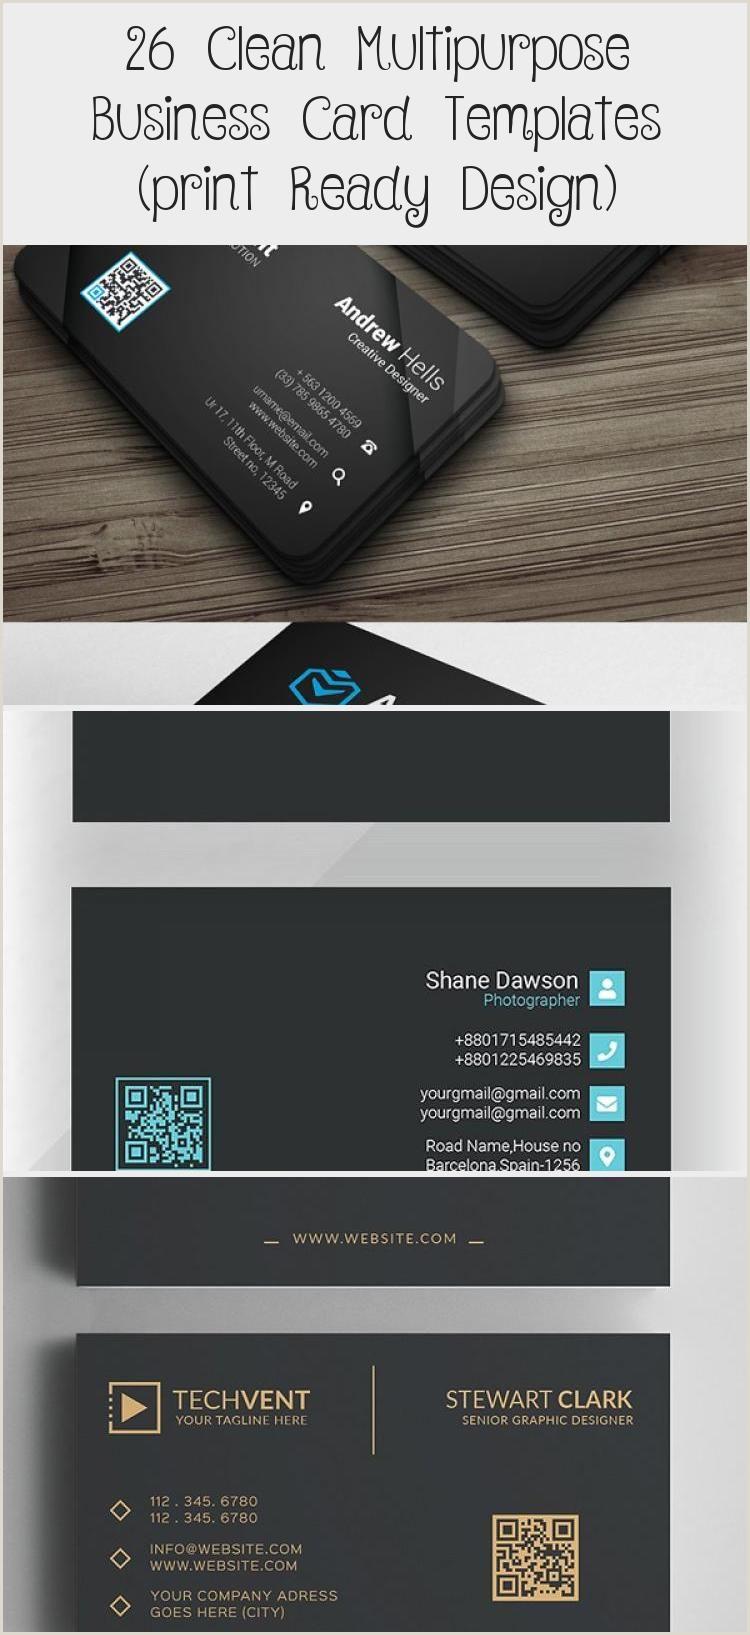 Business Card Design Website 26 Clean Multipurpose Business Card Templates Print Ready